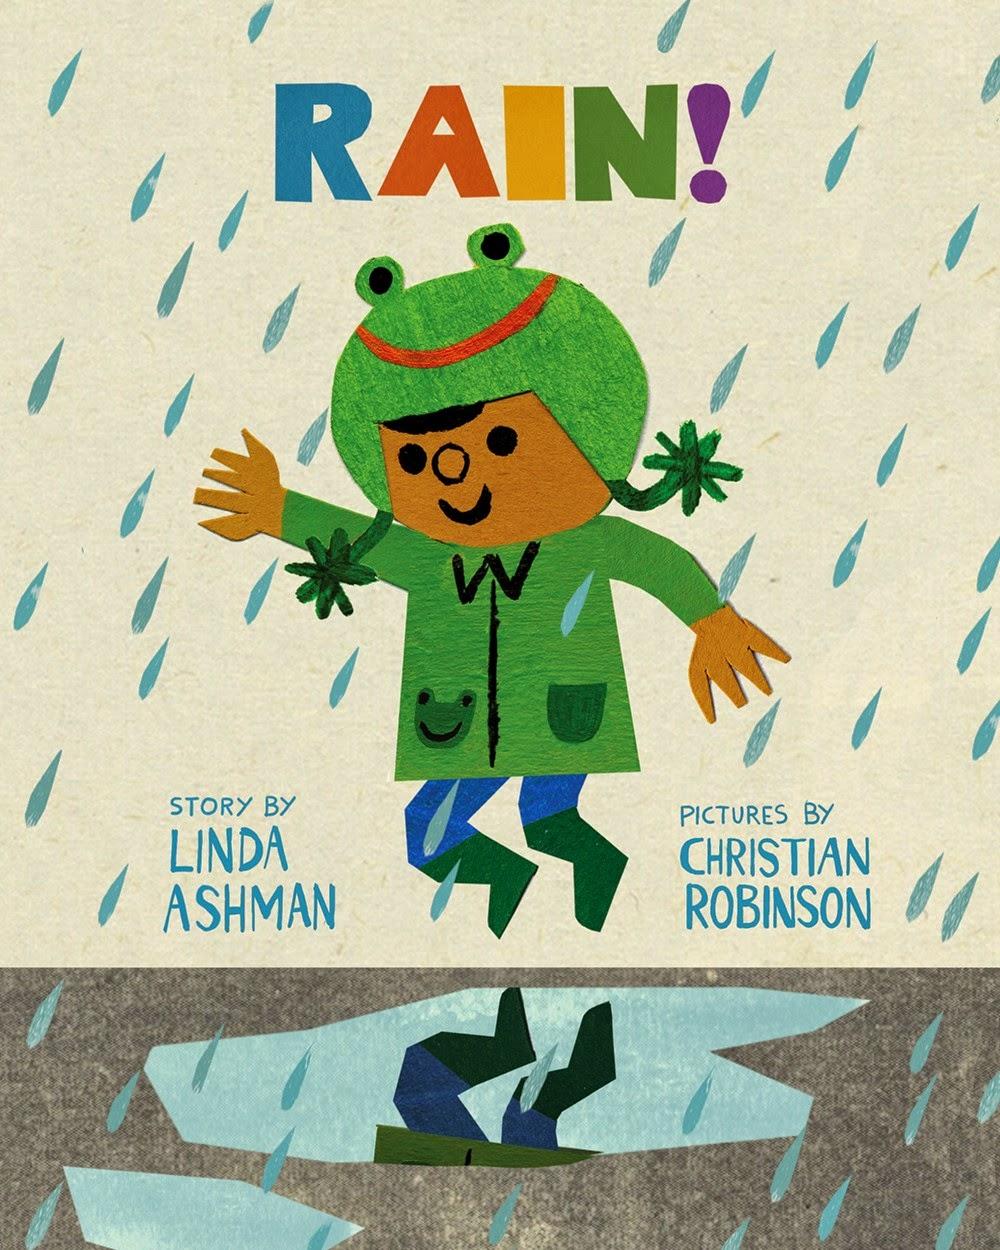 Celebrating the wonderful rain in california rain by linda ashman christian robinson ages 4 8